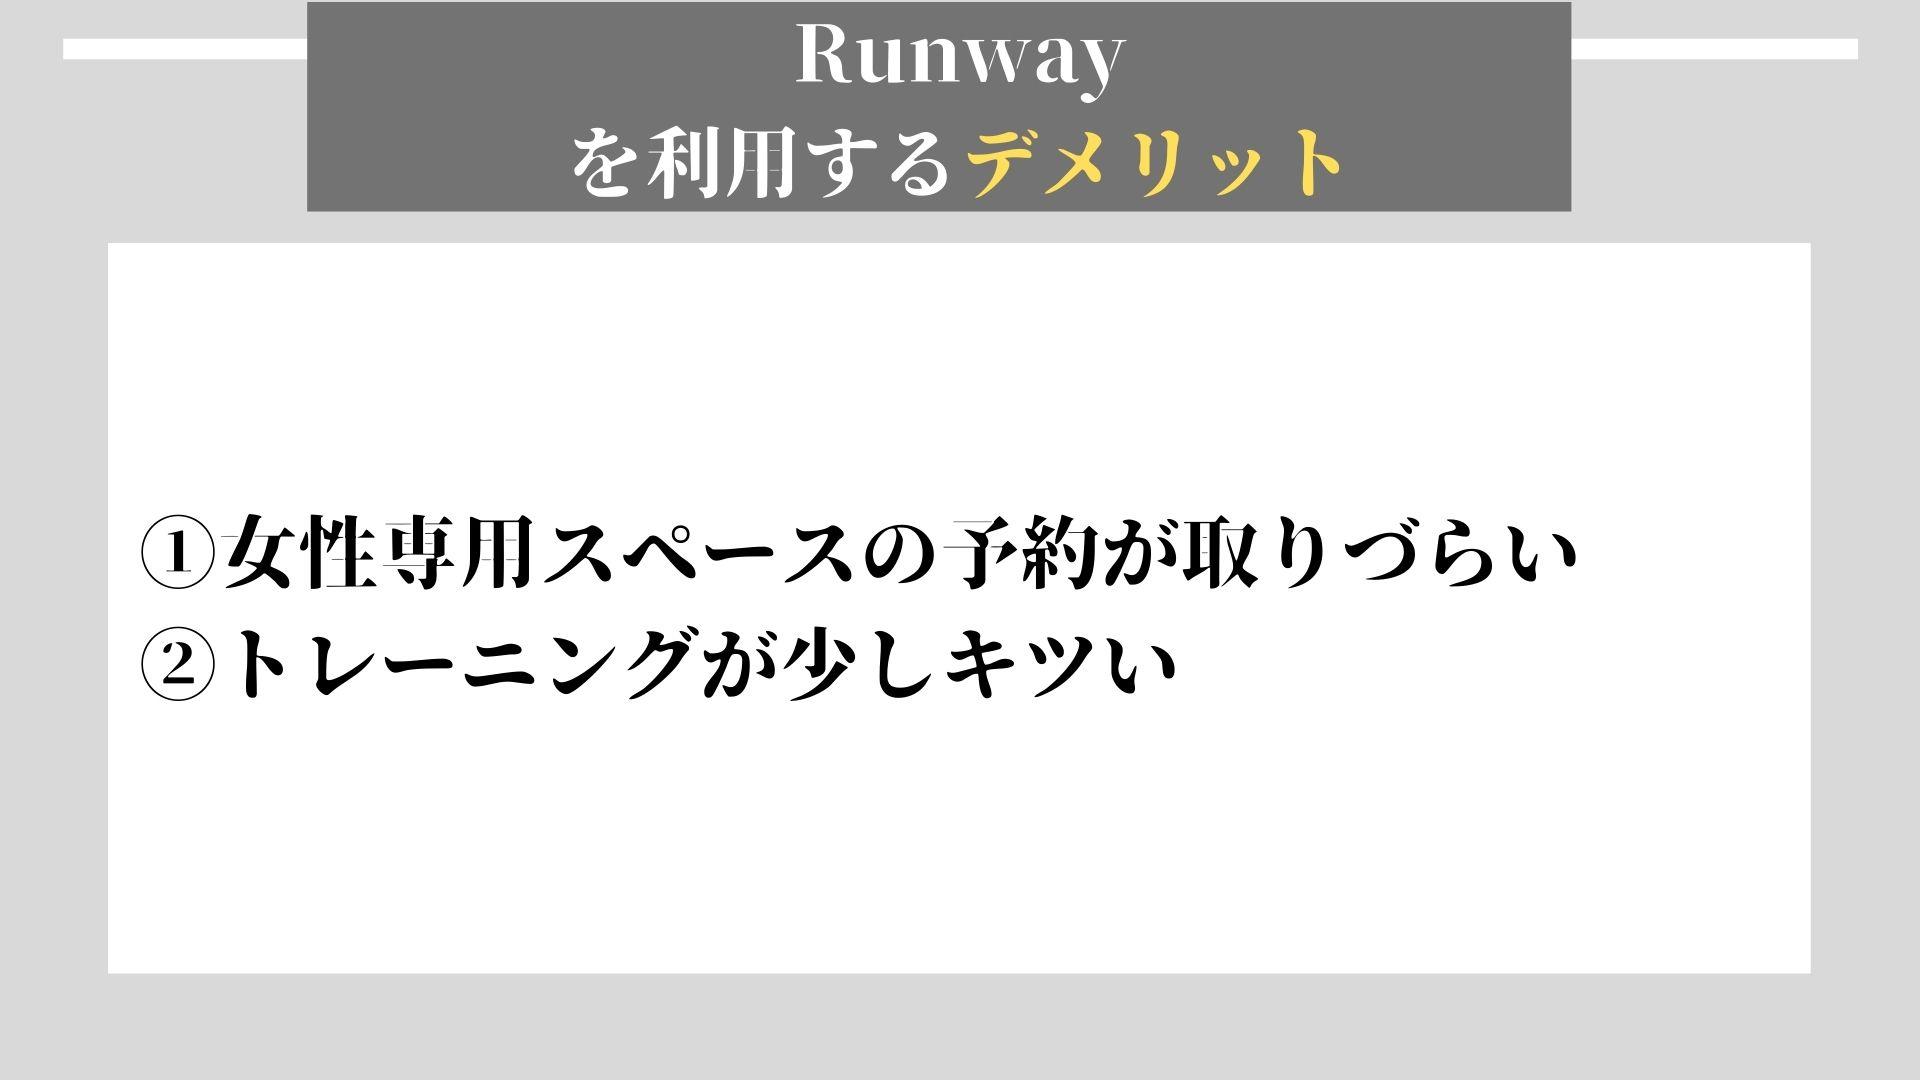 Runway デメリット